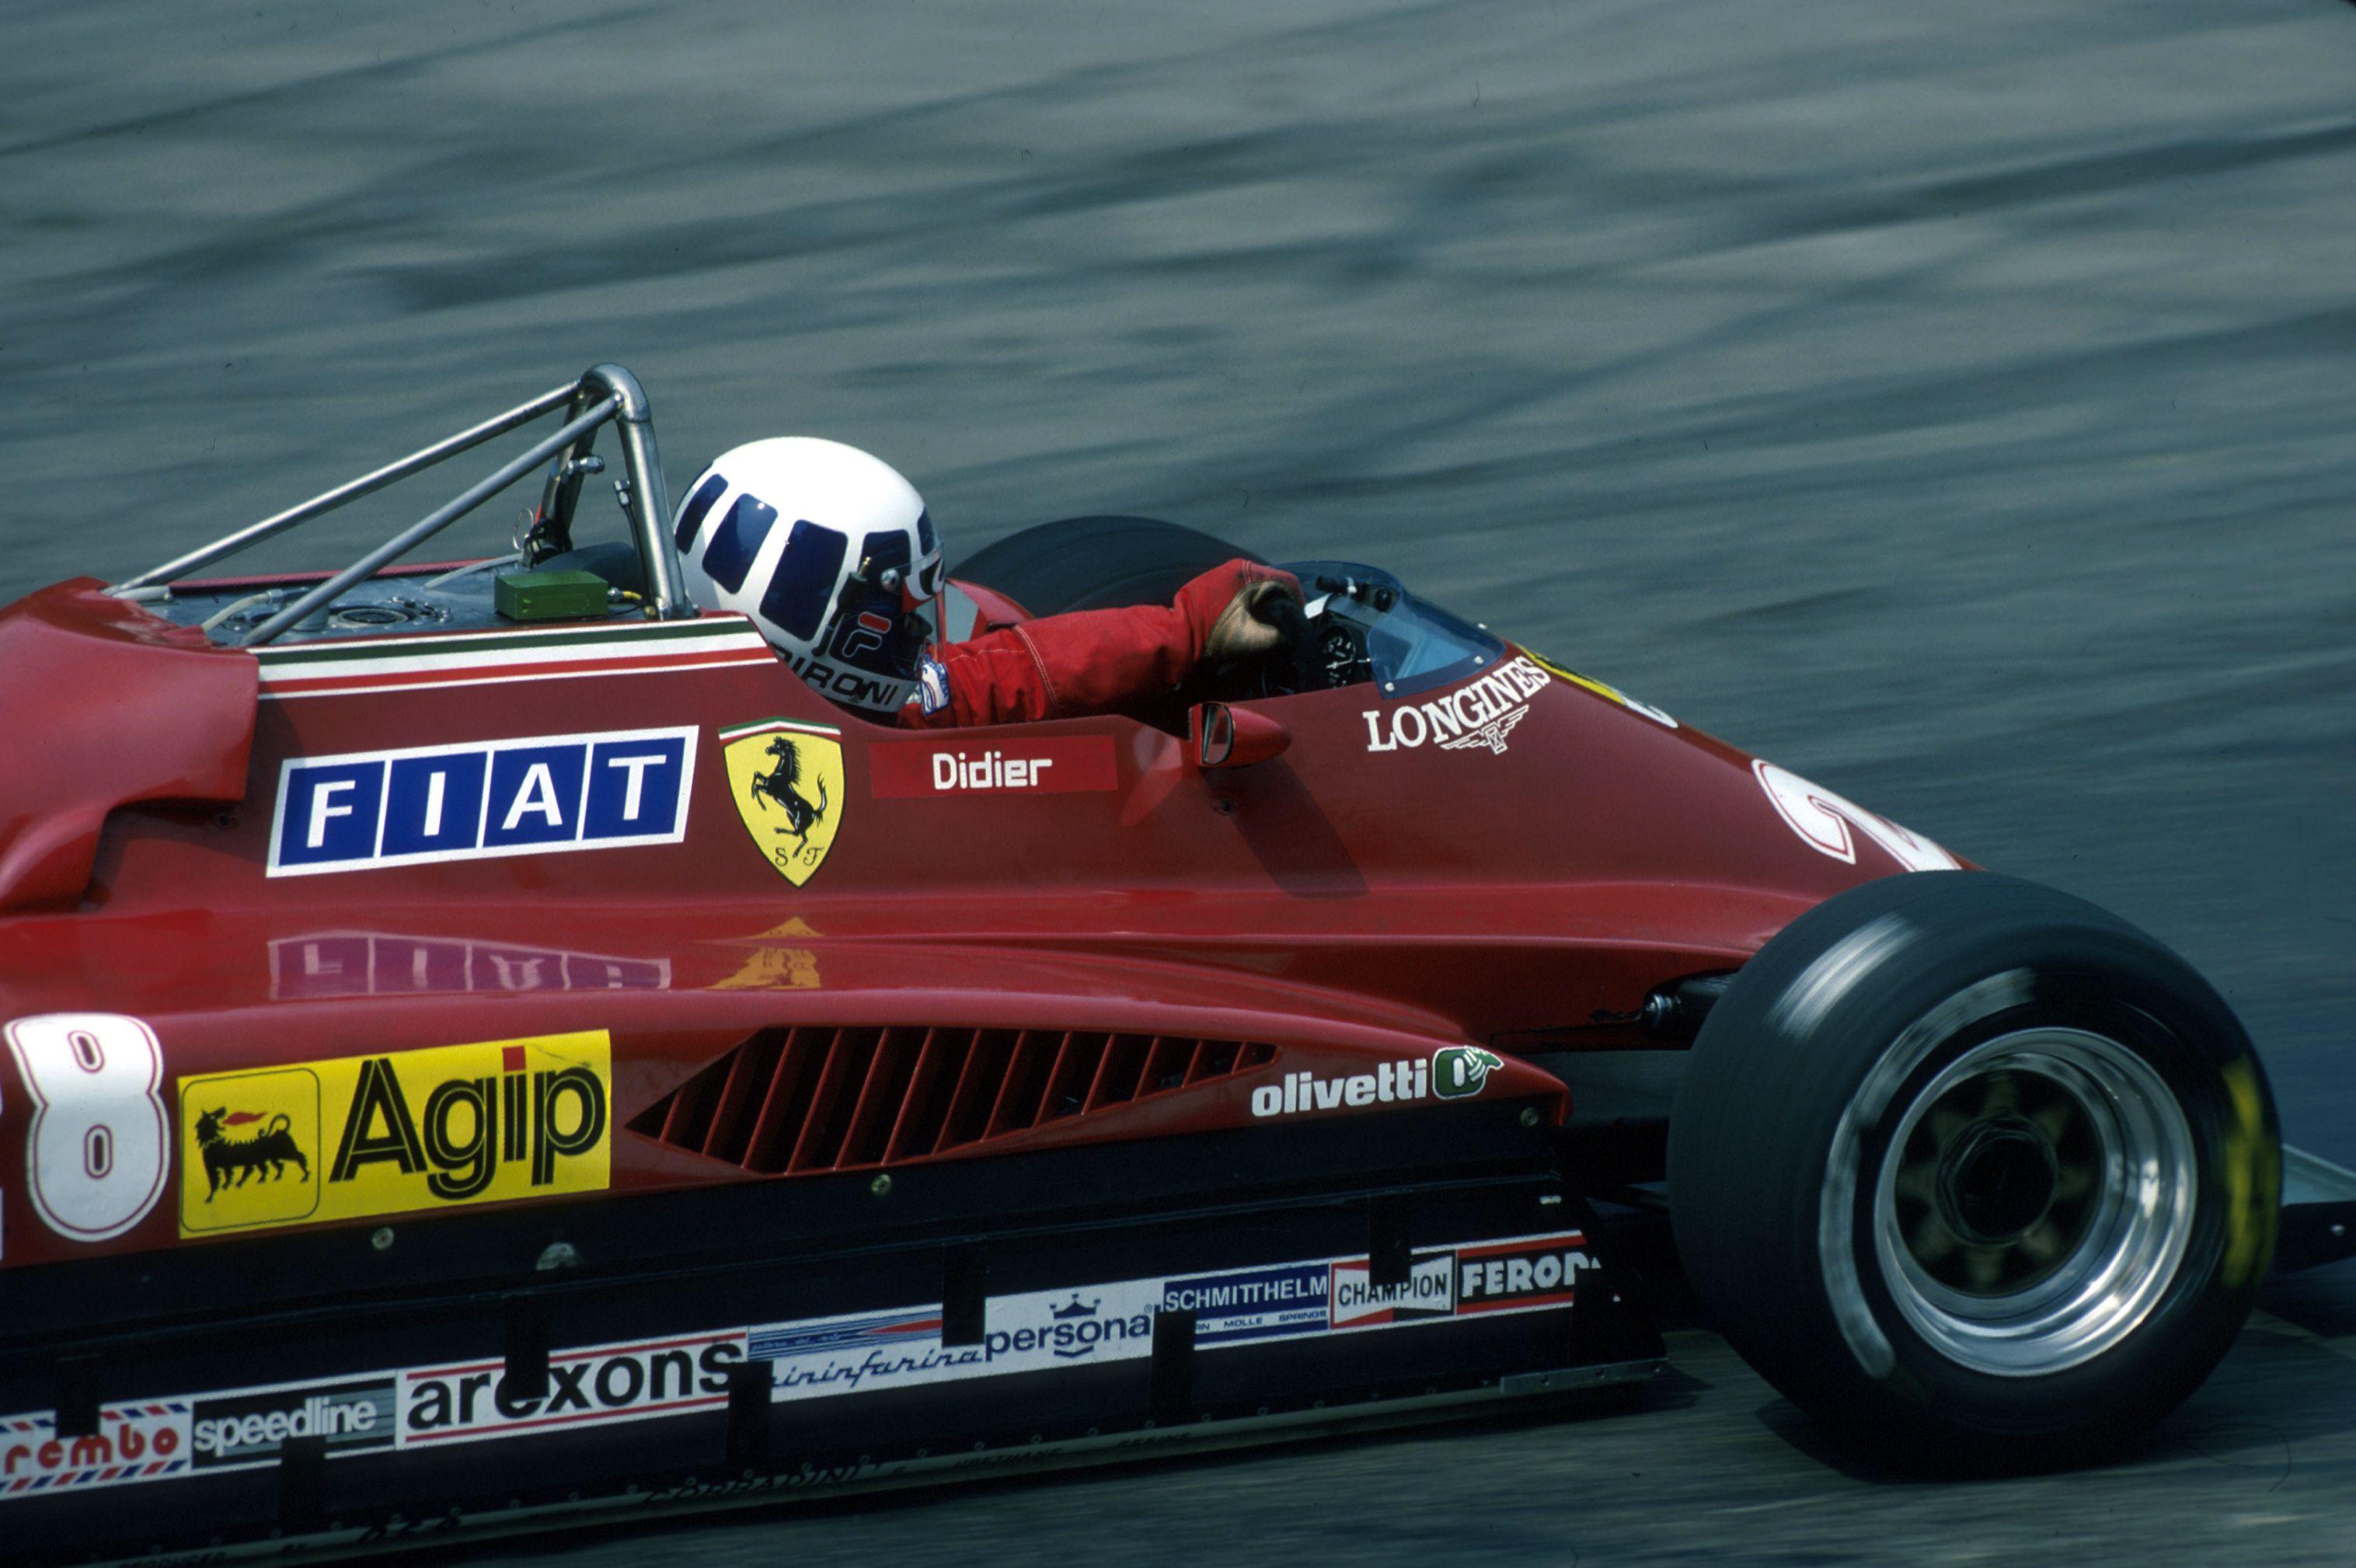 enzo ferrari and niki lauda with 70ferrari Ferrari F1 6 Cilindri Turbo 1980 1988 on Flying Ferraris Flugplatz Niki Lauda German Gp 1975 as well 1 as well 350 Ediciones Especiales Ferrari Por Su 70 Cumpleanos 294083 likewise Shadow Dn5 Formula 1 Car as well Gilles Villeneuve.